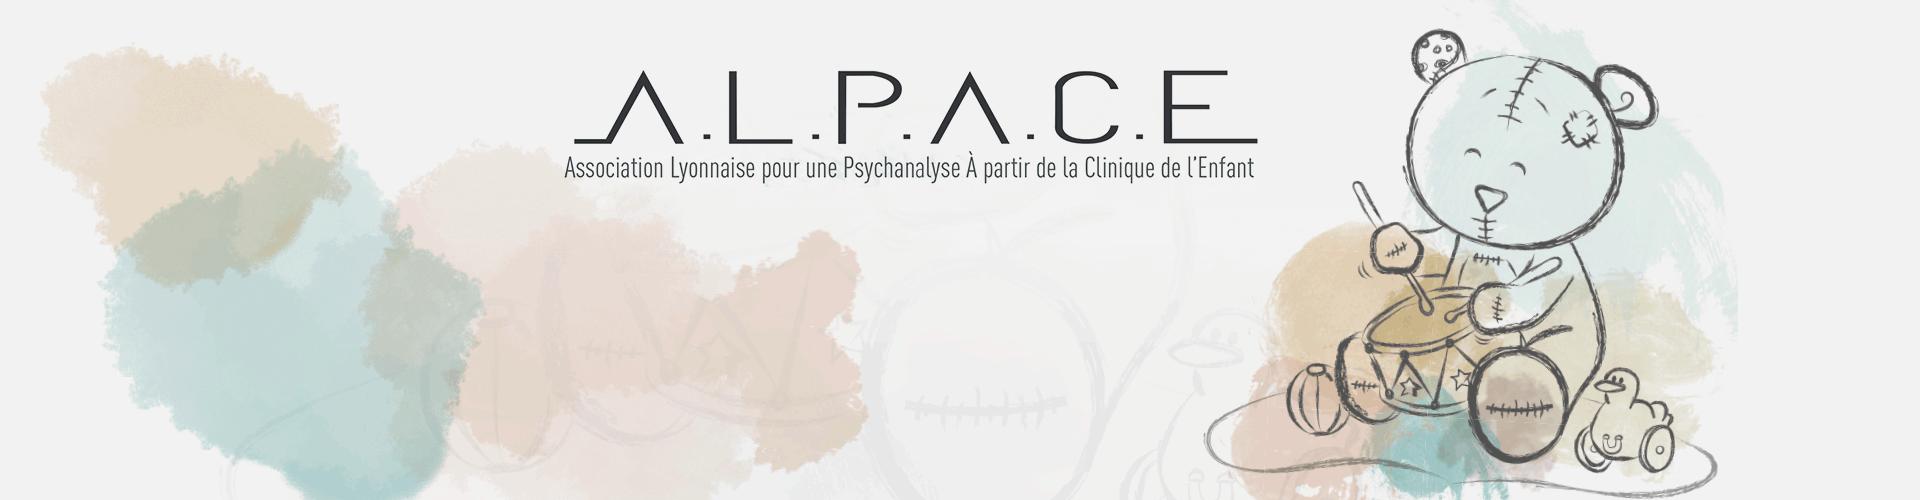 colloque-alpace-2018.png